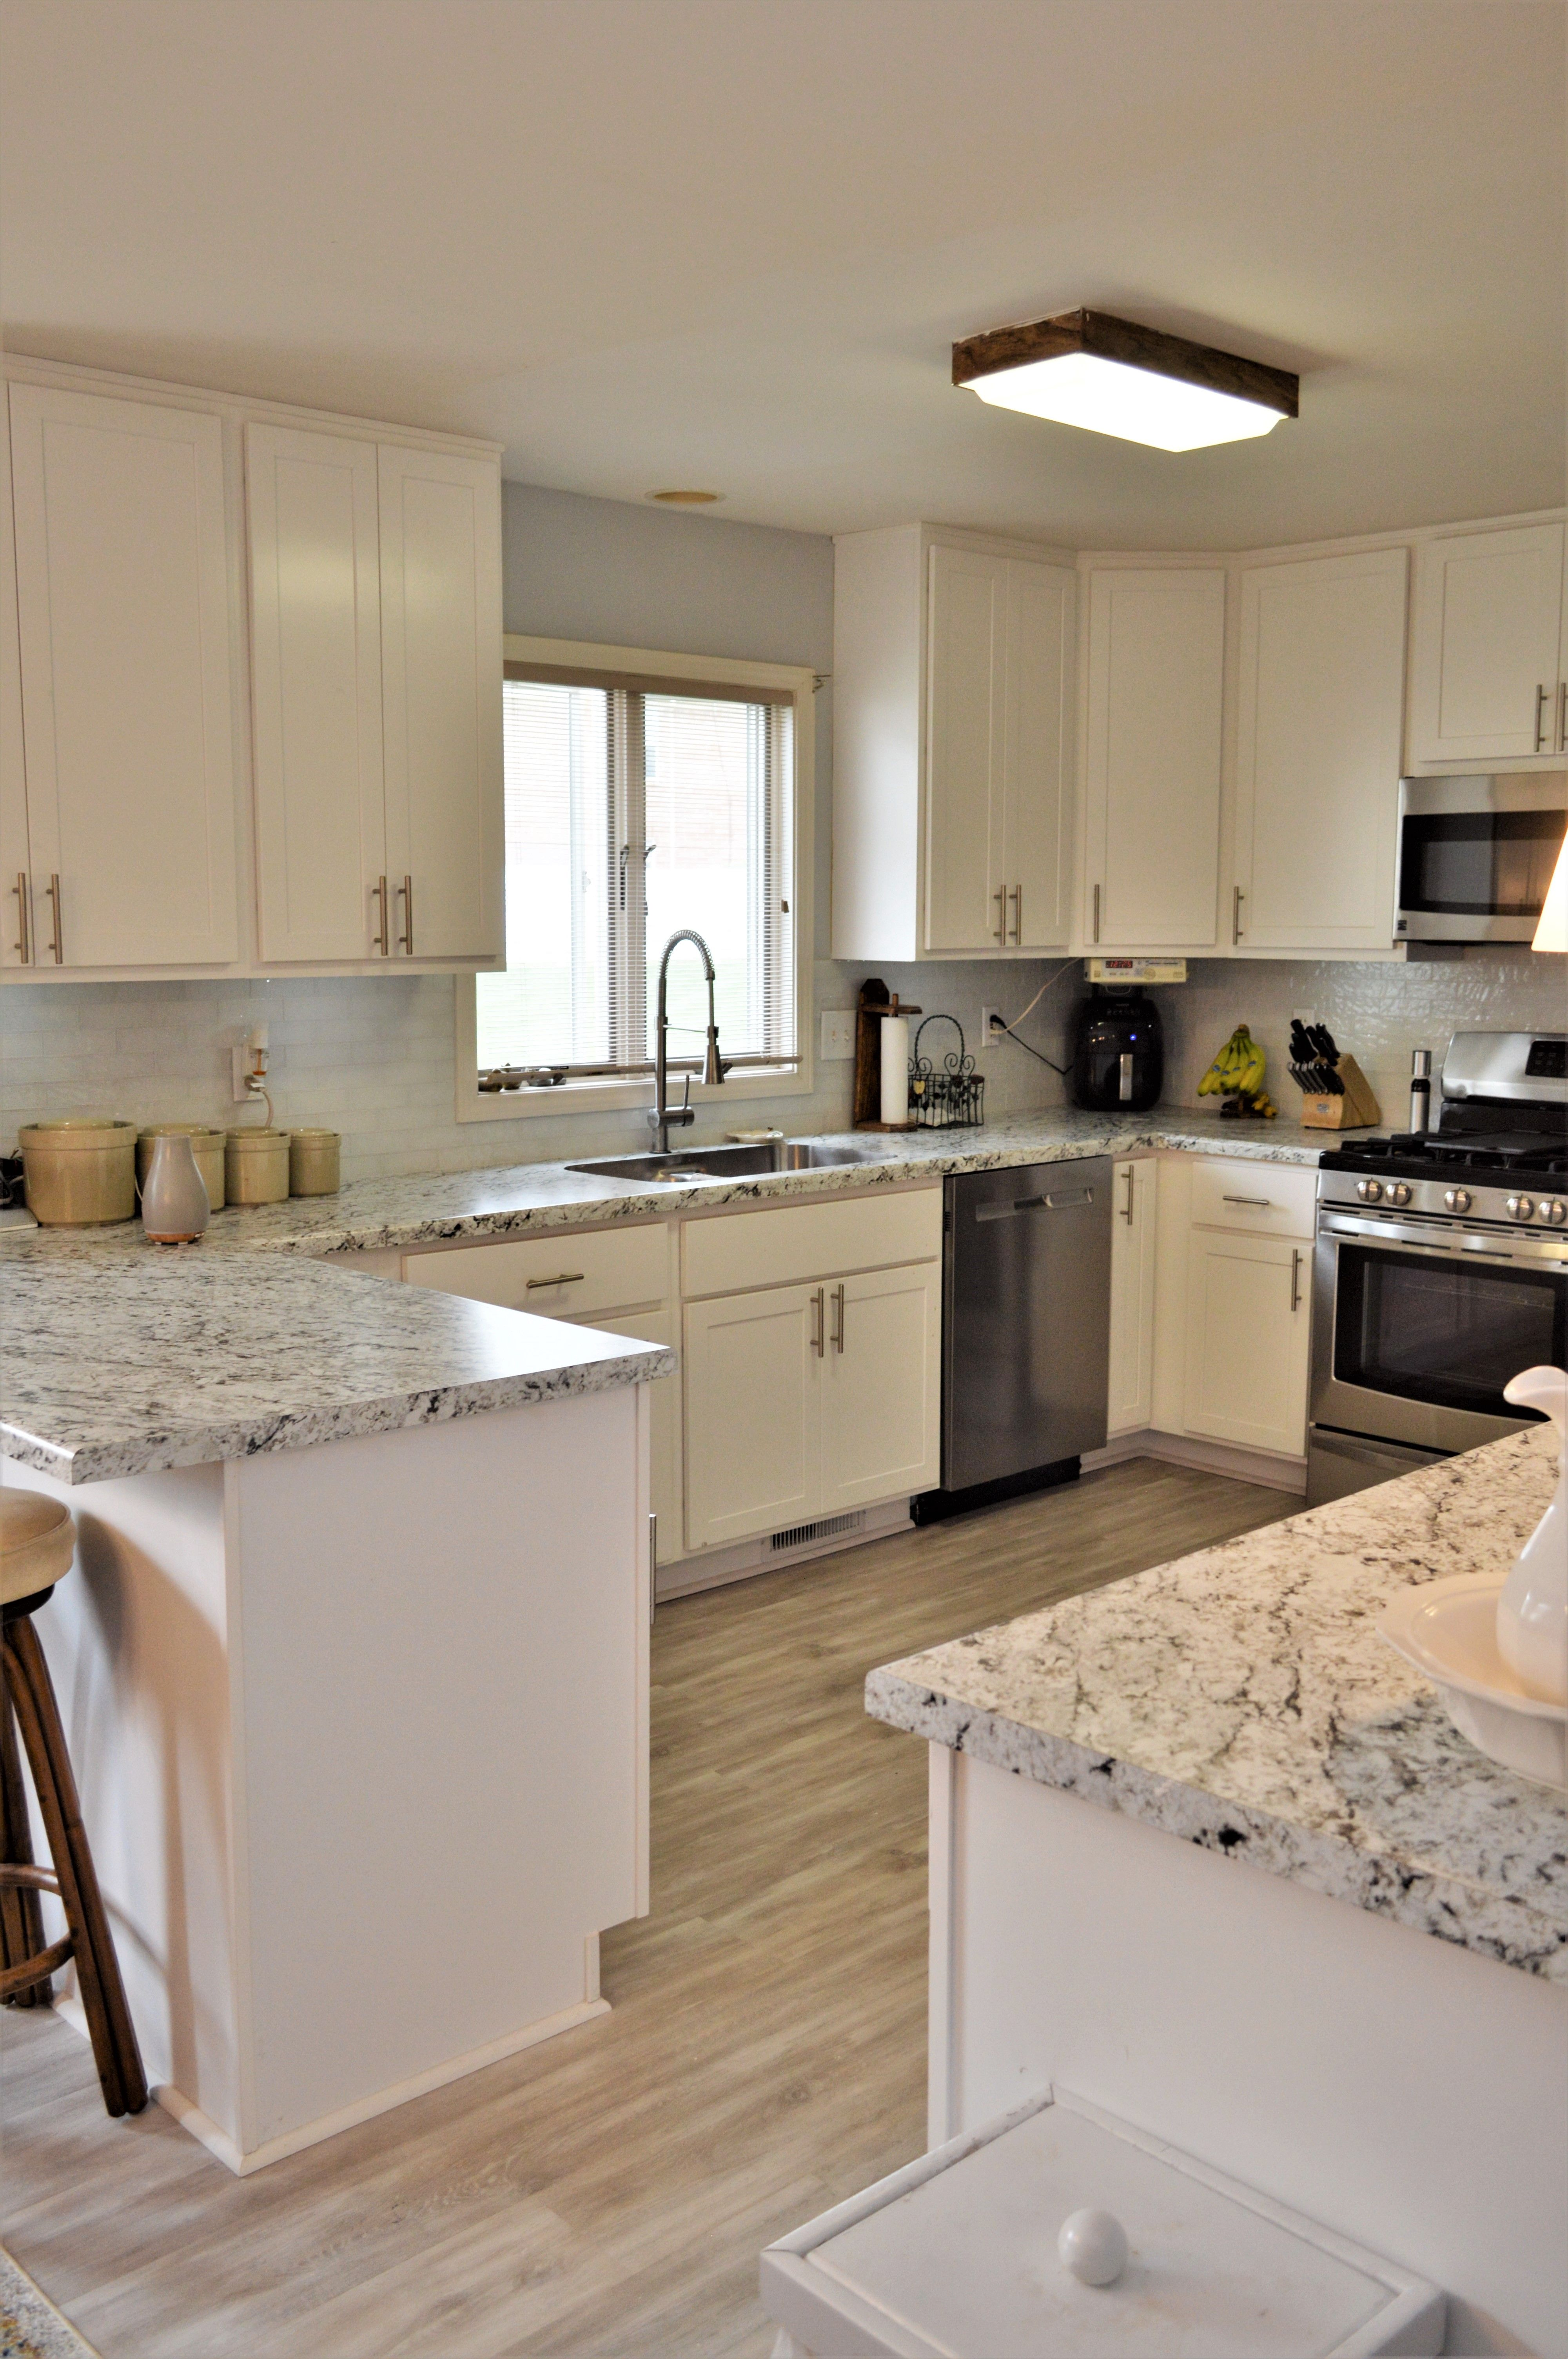 Laminate countertop, Modern edge detail, White Ice Granite